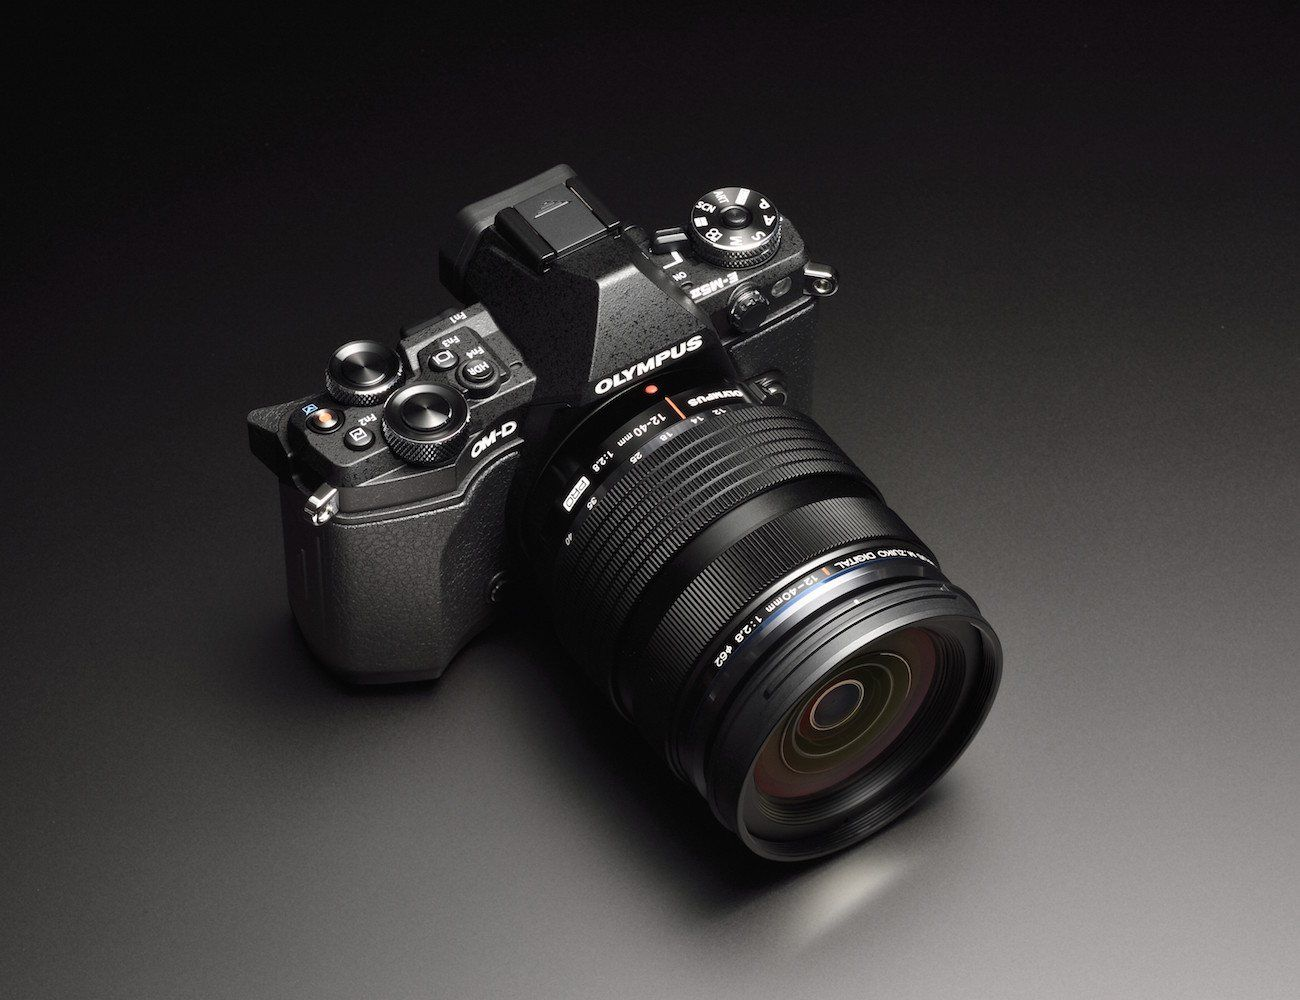 Olympus Om D E M5 Mark Ii Olympus Camera Camera Photography Antique Cameras